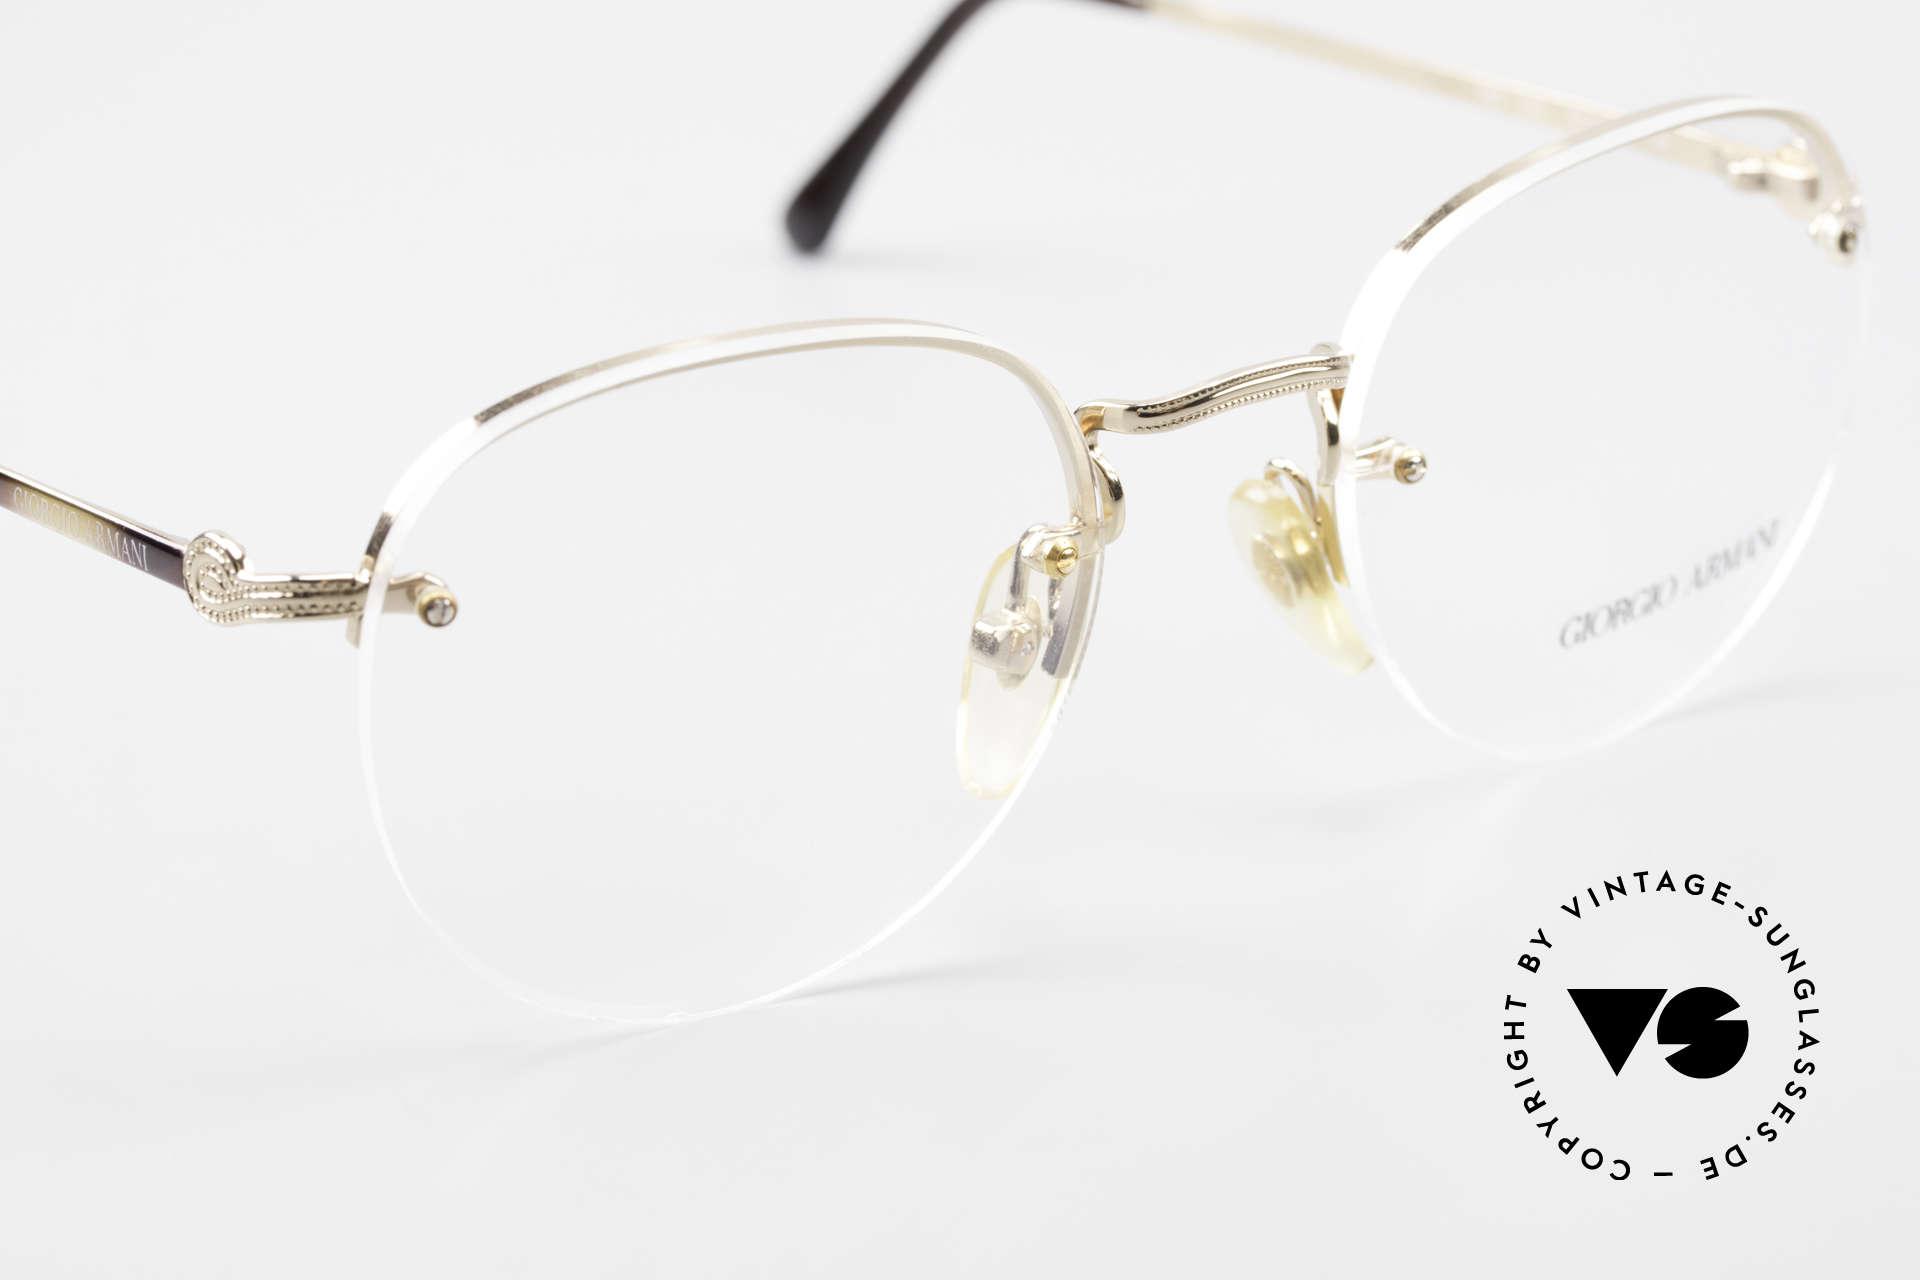 Giorgio Armani 161 Rimless Vintage Eyeglasses 80s, NO RETRO EYEGLASSES, but true 1980's commodity, Made for Men and Women